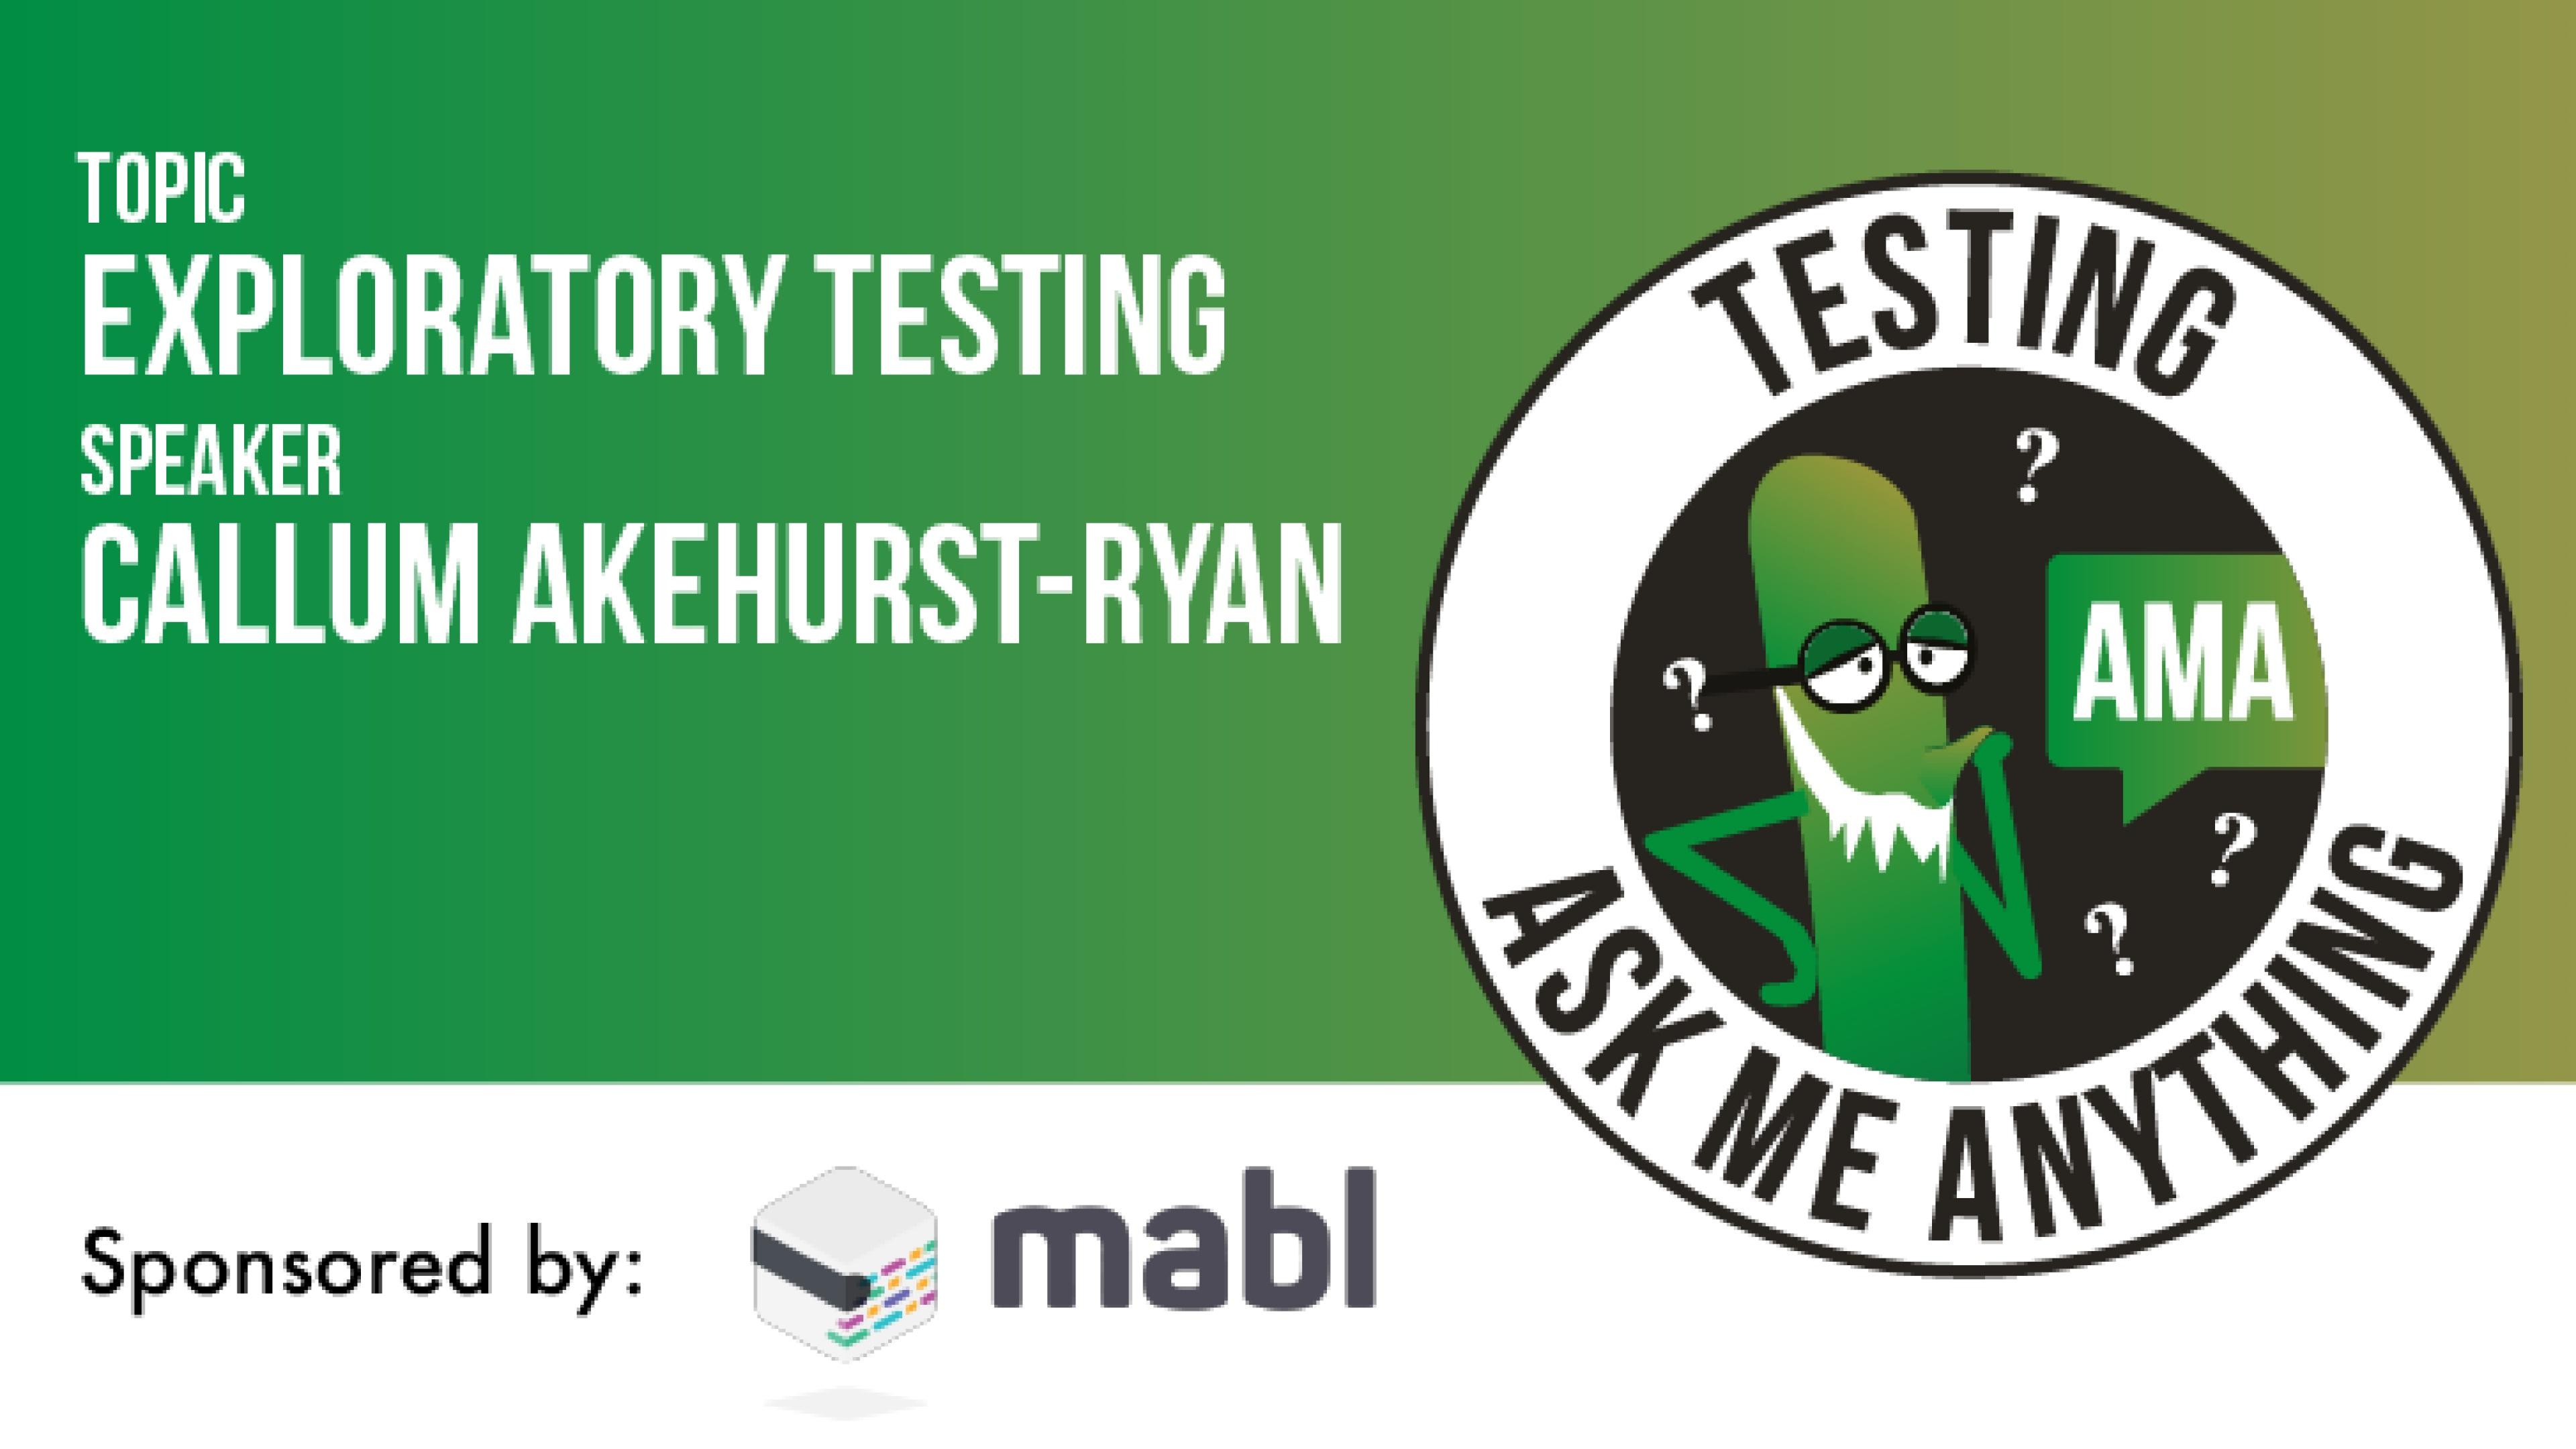 Testing Ask Me Anything - Exploratory Testing - Callum Akehurst-Ryan